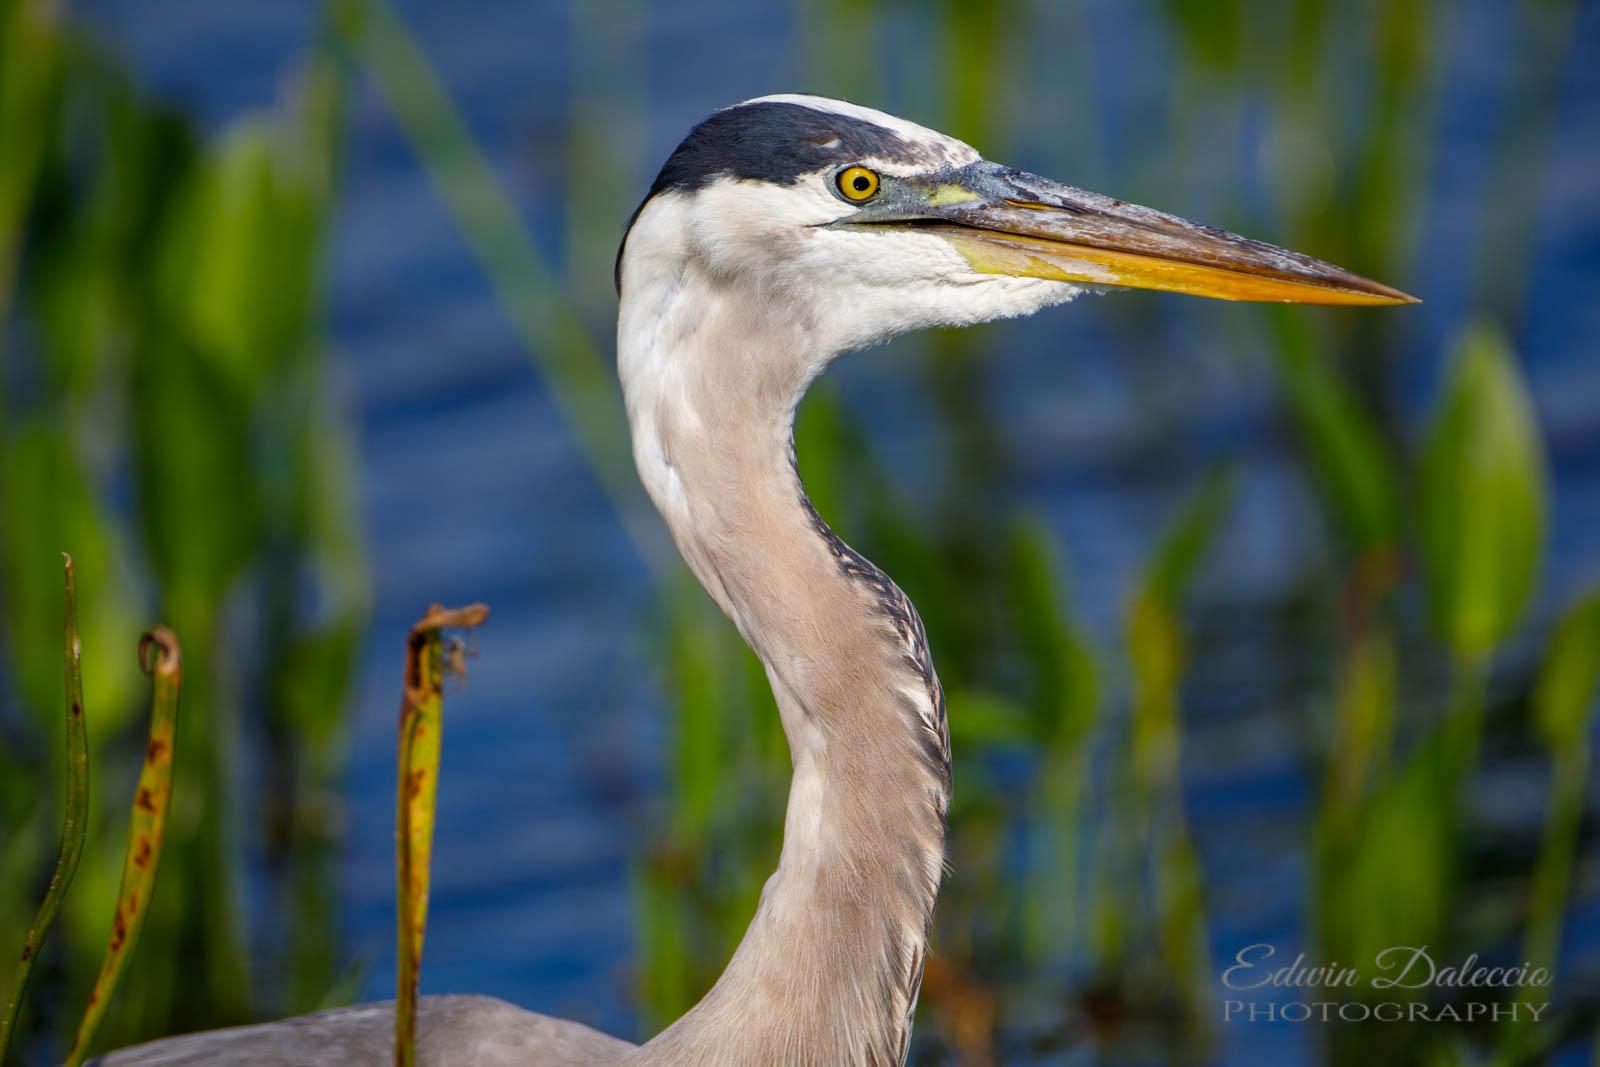 IMAGE: http://s152588970.onlinehome.us/PiCs/2019/Birding/Orlando%20Wetlands%20April%2013/DL5A1308.jpg